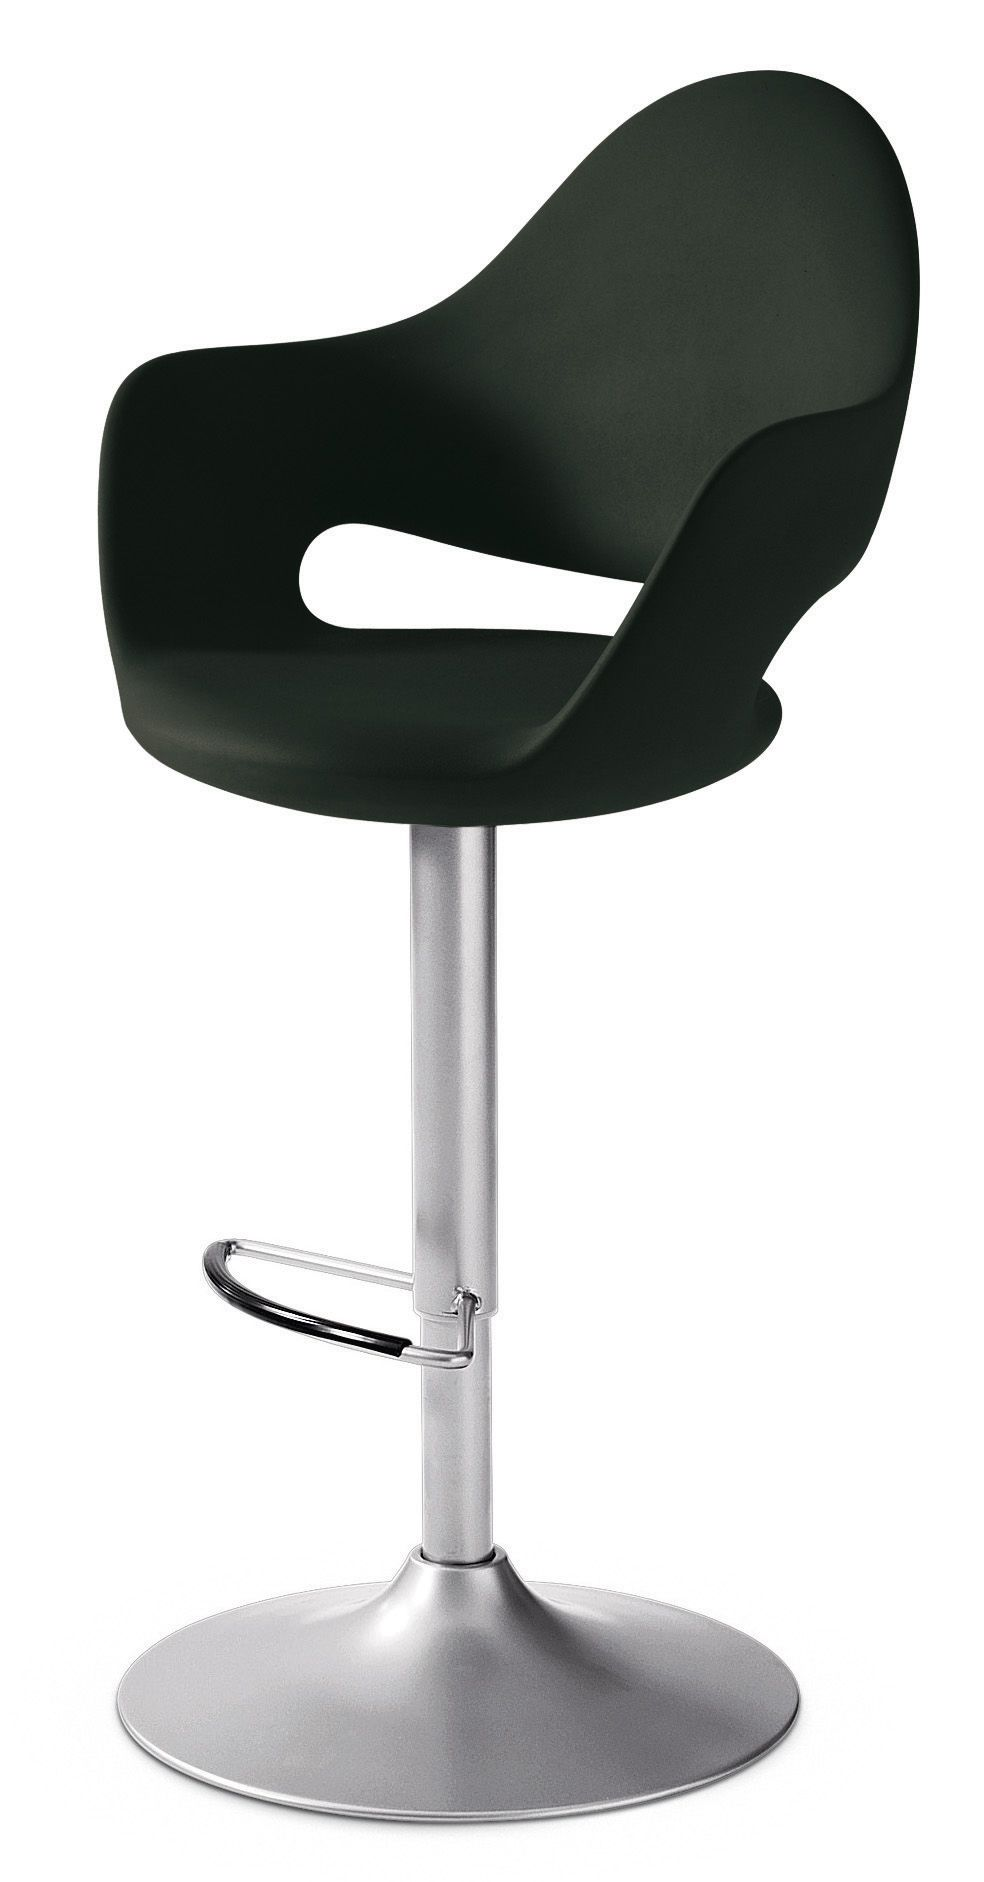 Domitalia's Soft-SG stool for breakfast bar. #LGLimitlessDesign #Contest